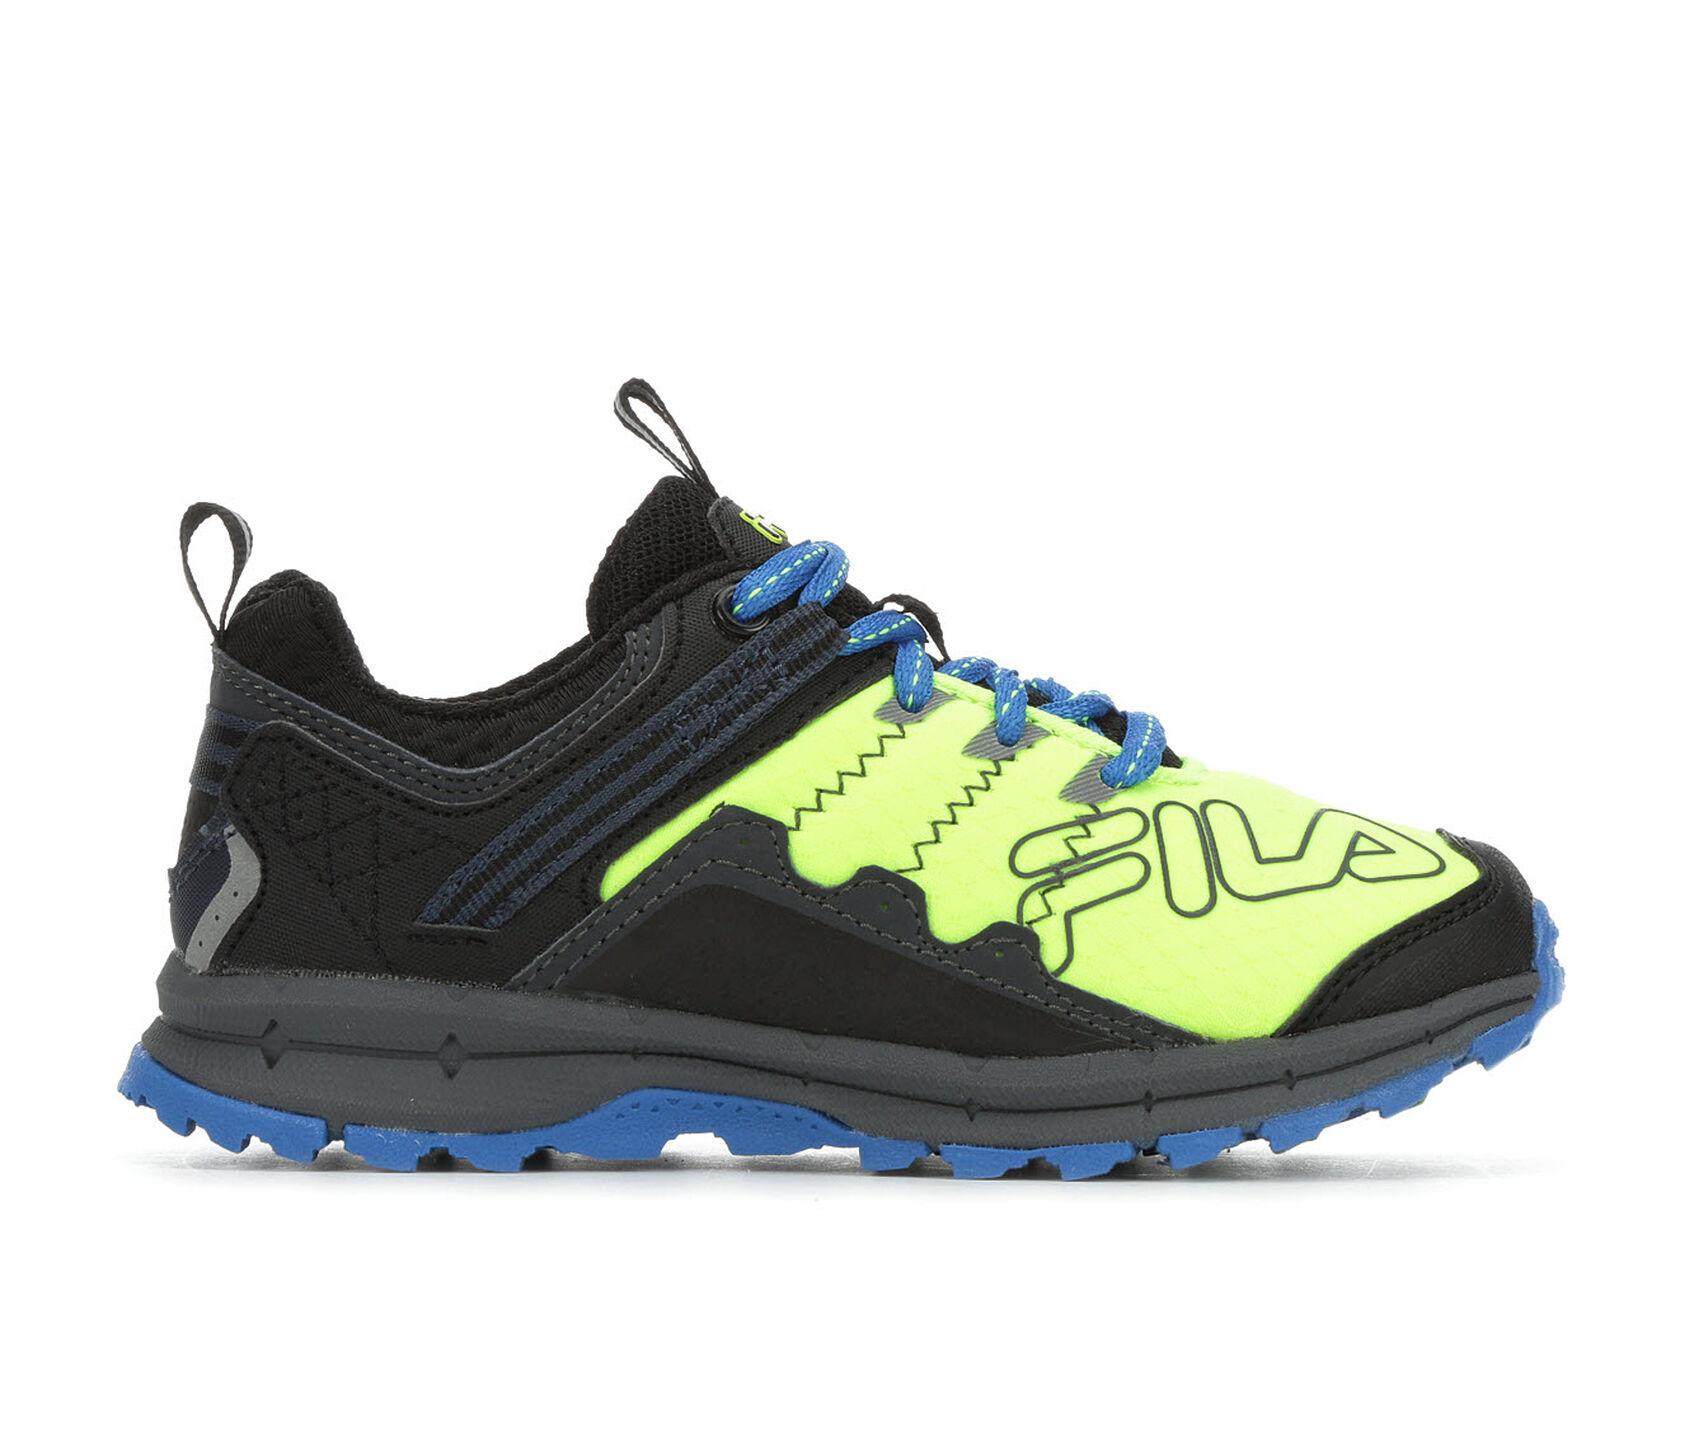 12b18462c7f Boys' Fila Little Kid & Big Kid Blowout Outdoor Sneakers